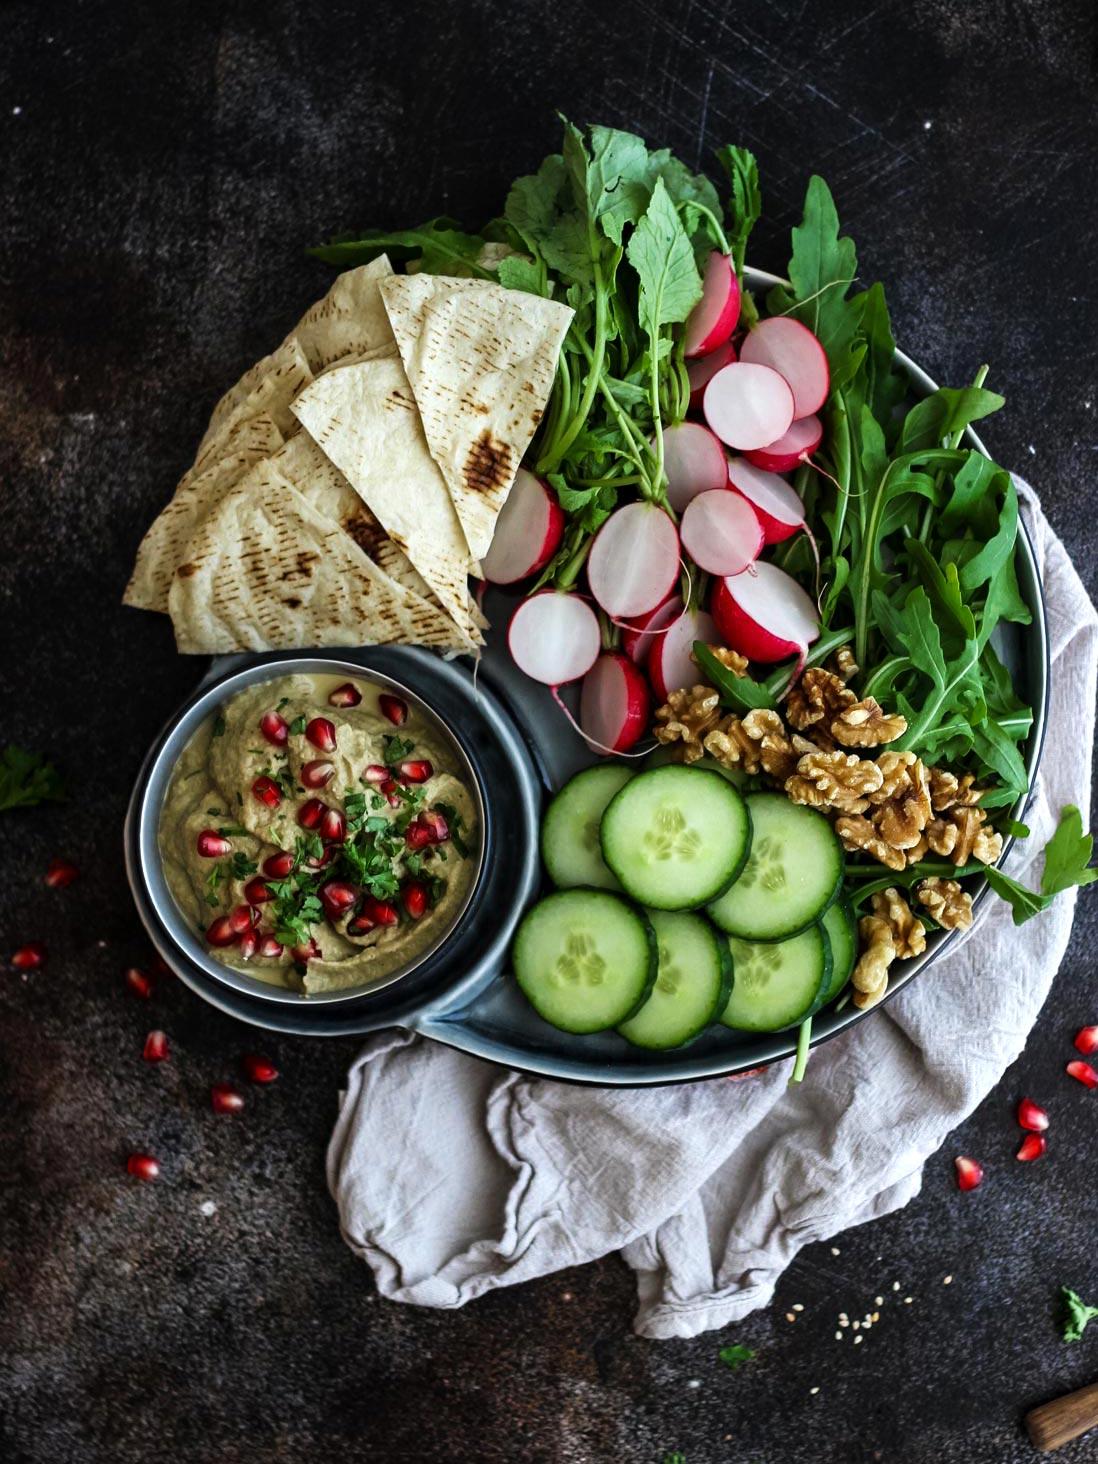 Veggie Plate with Vegan Eggplant Dip